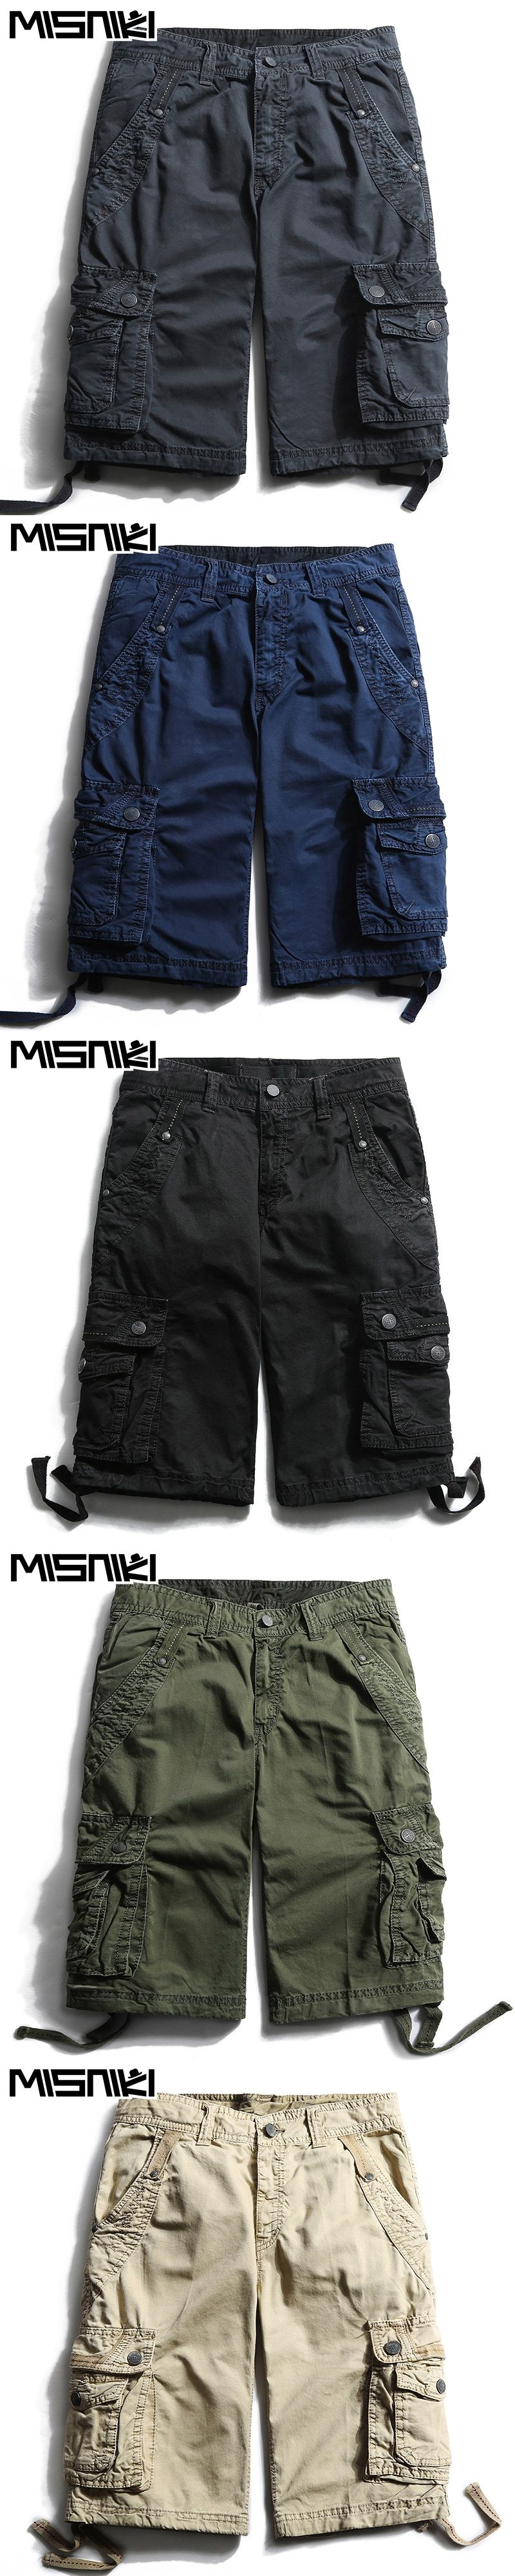 6736b021d3 MISNIKI High Quality Cotton Cargo Shorts Men Casual Slim Multi-pocket  Military Shorts Mens